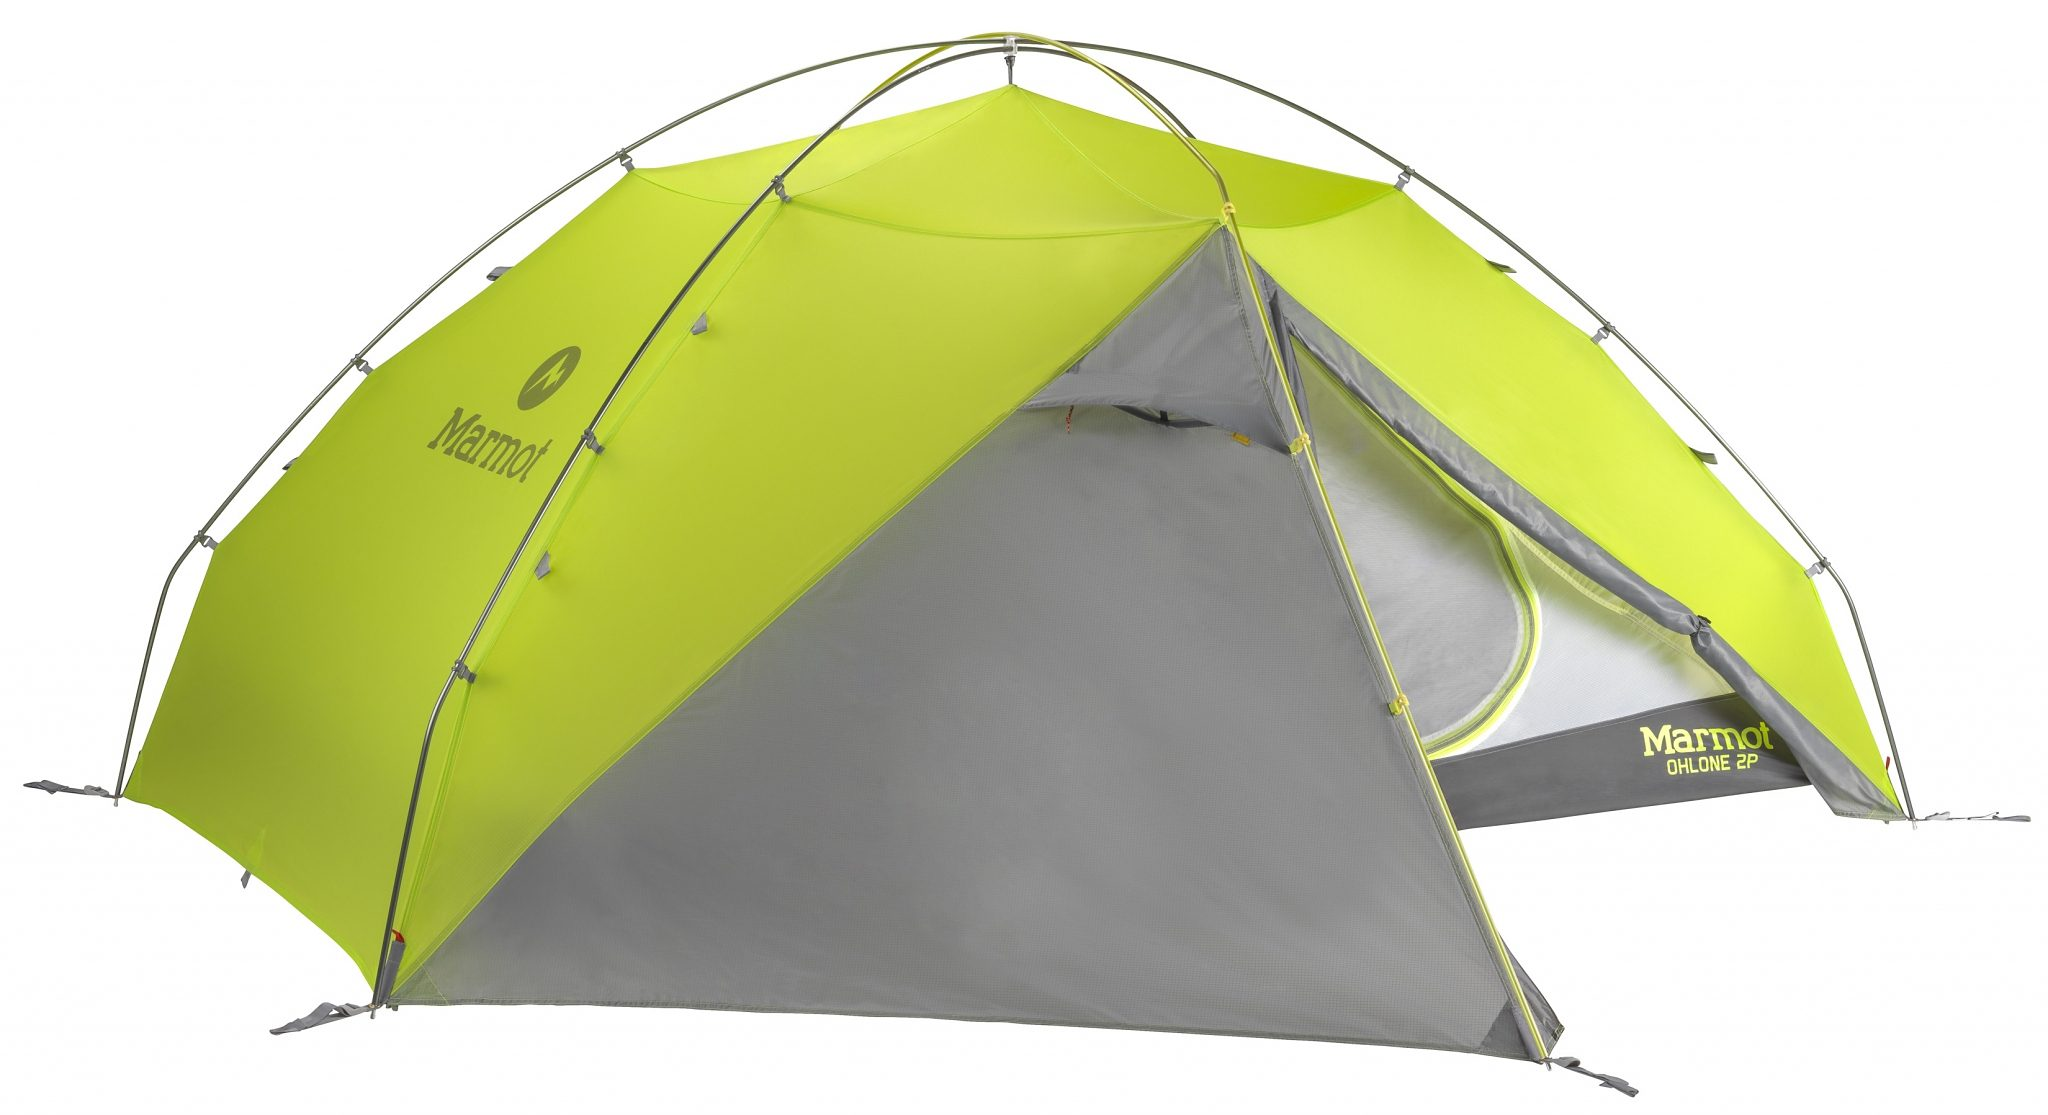 Marmot Zelt »Ohlone 2P Tent«